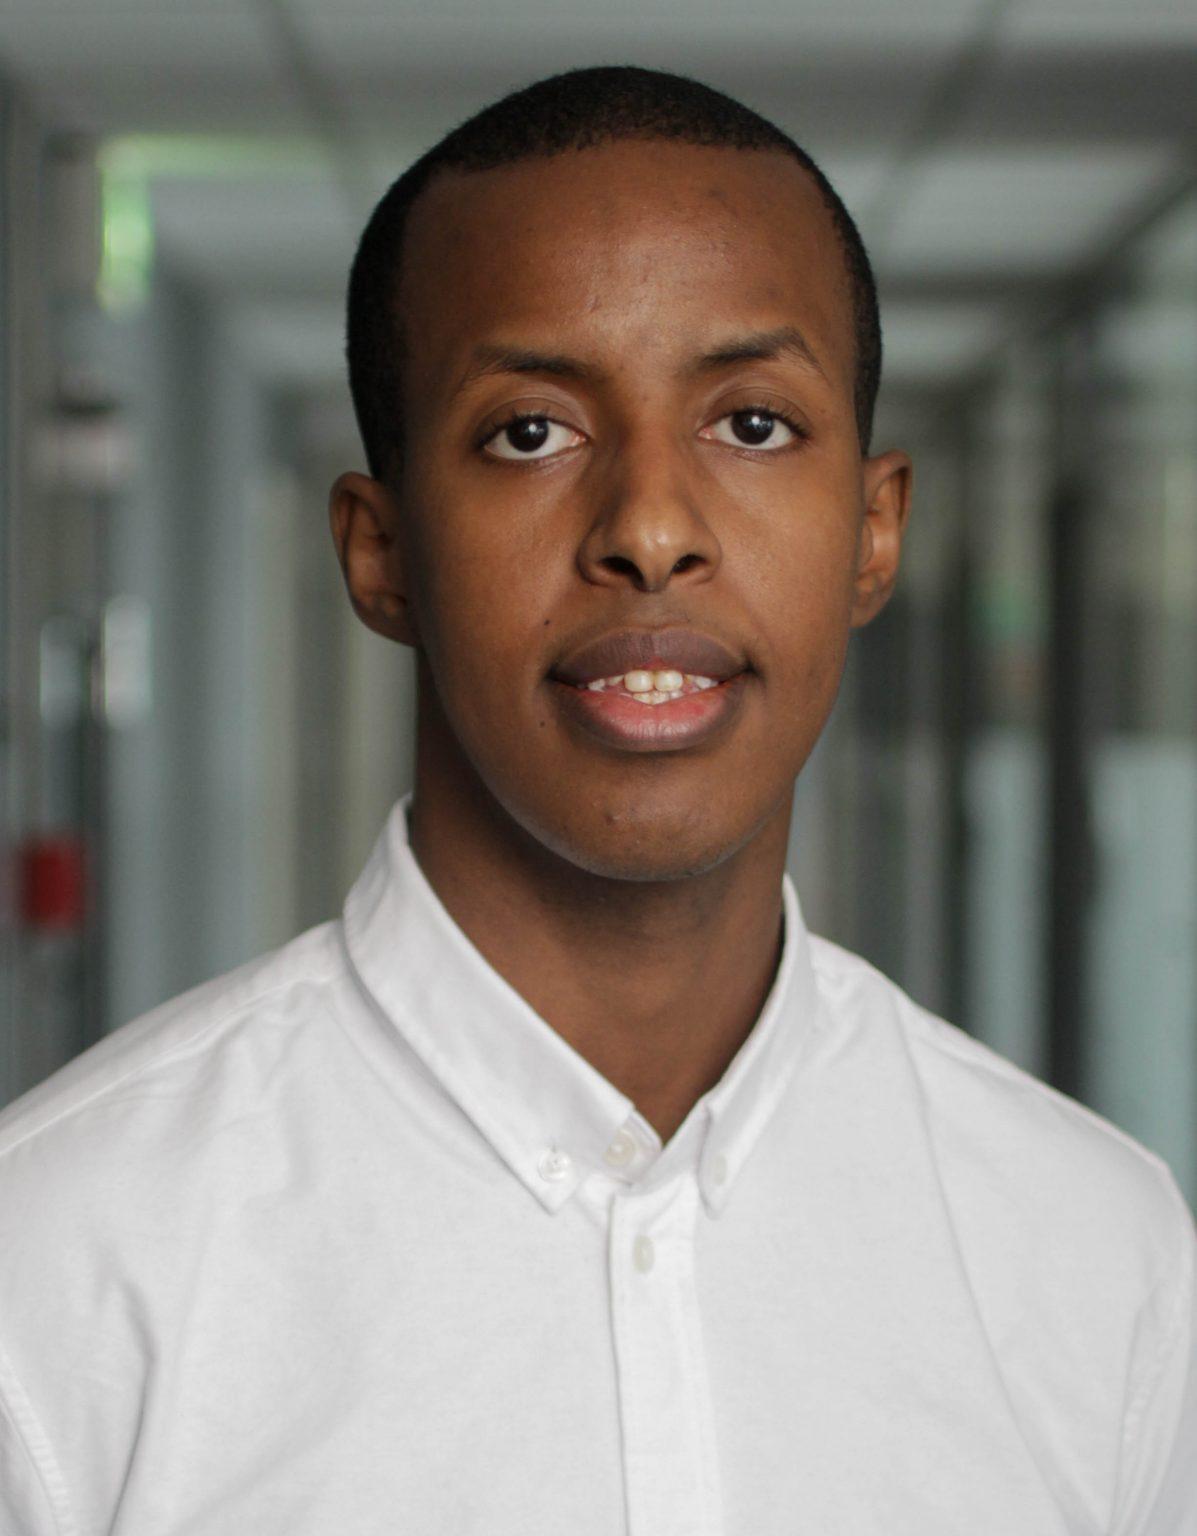 Mahamud Ismail